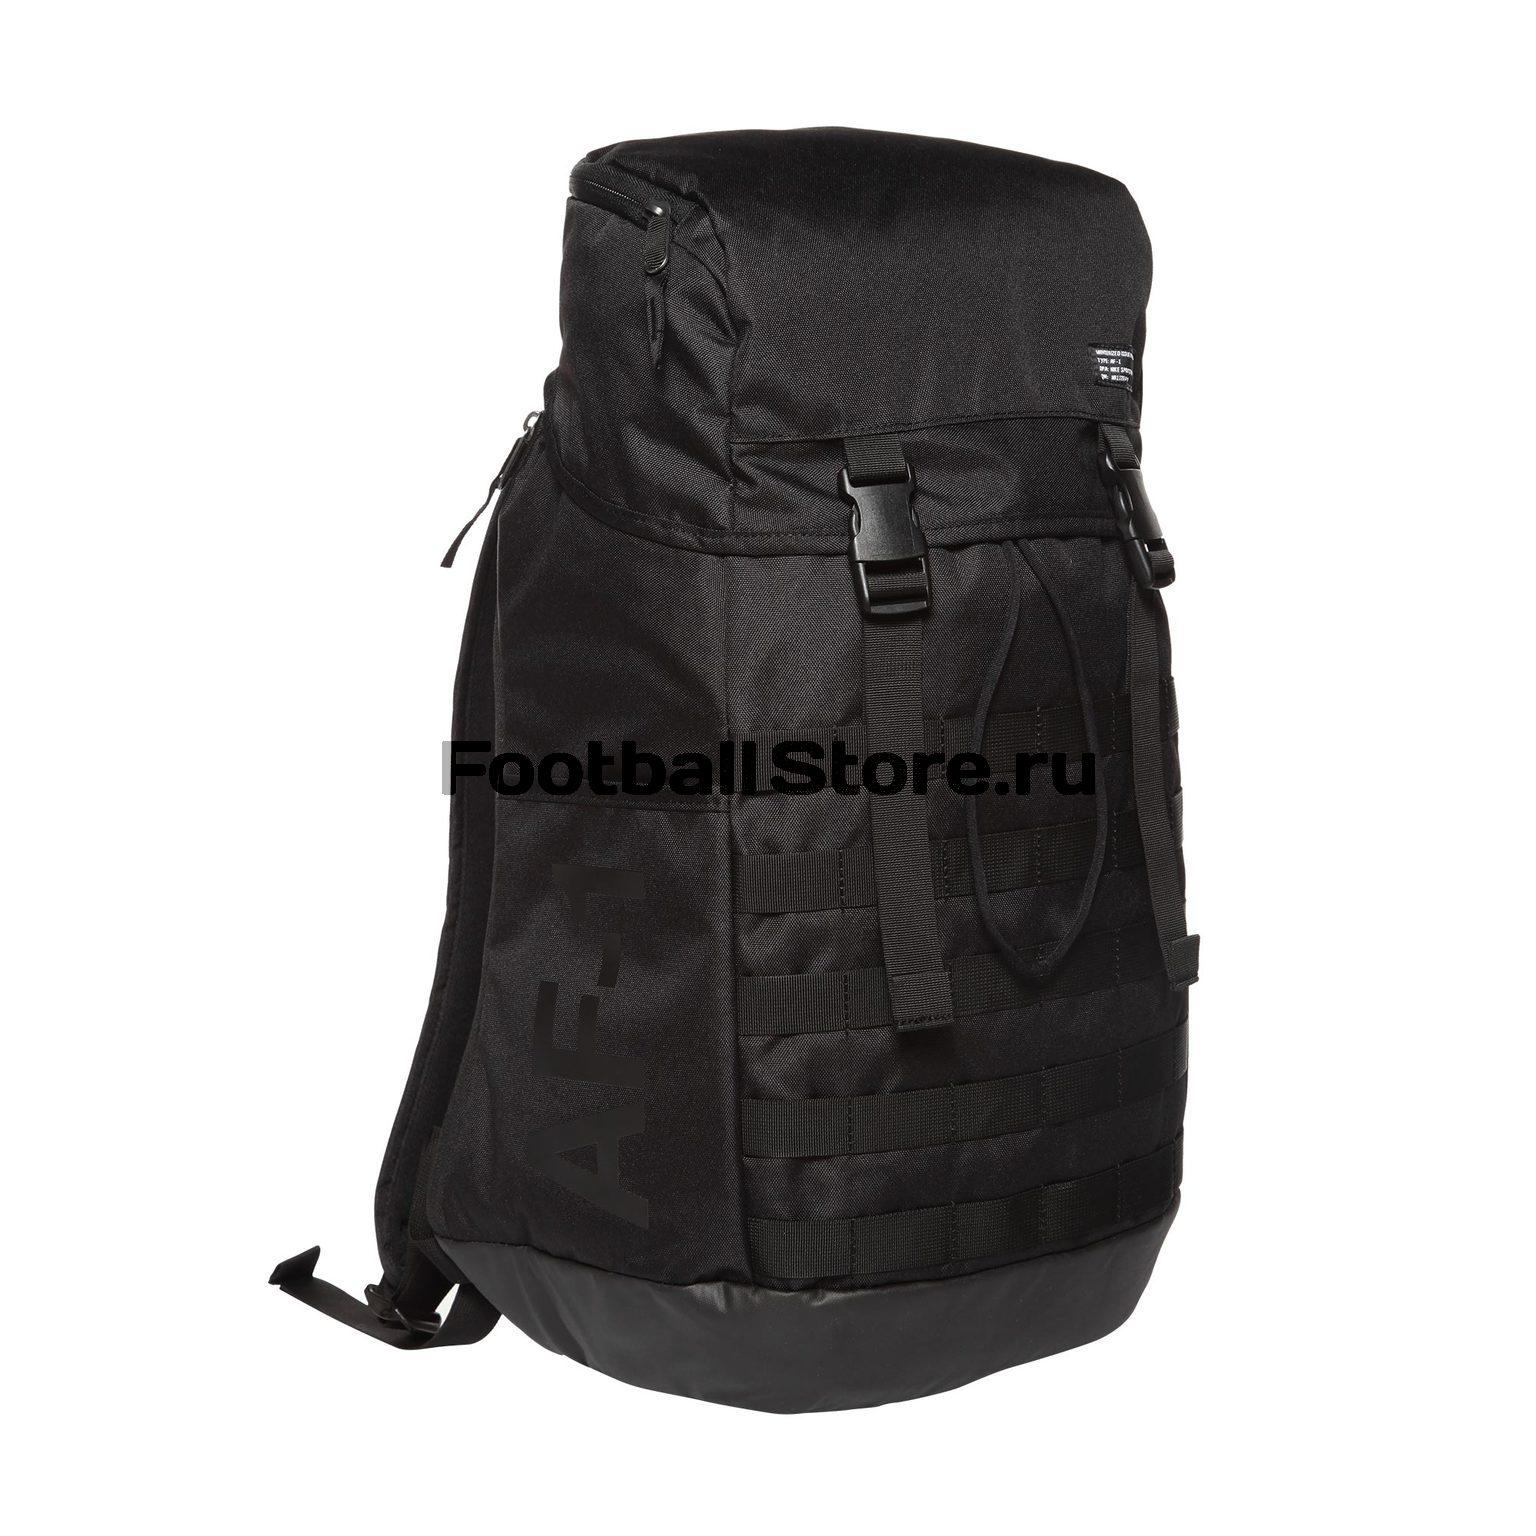 Рюкзак Nike AF-1 Backpack BA5731-010